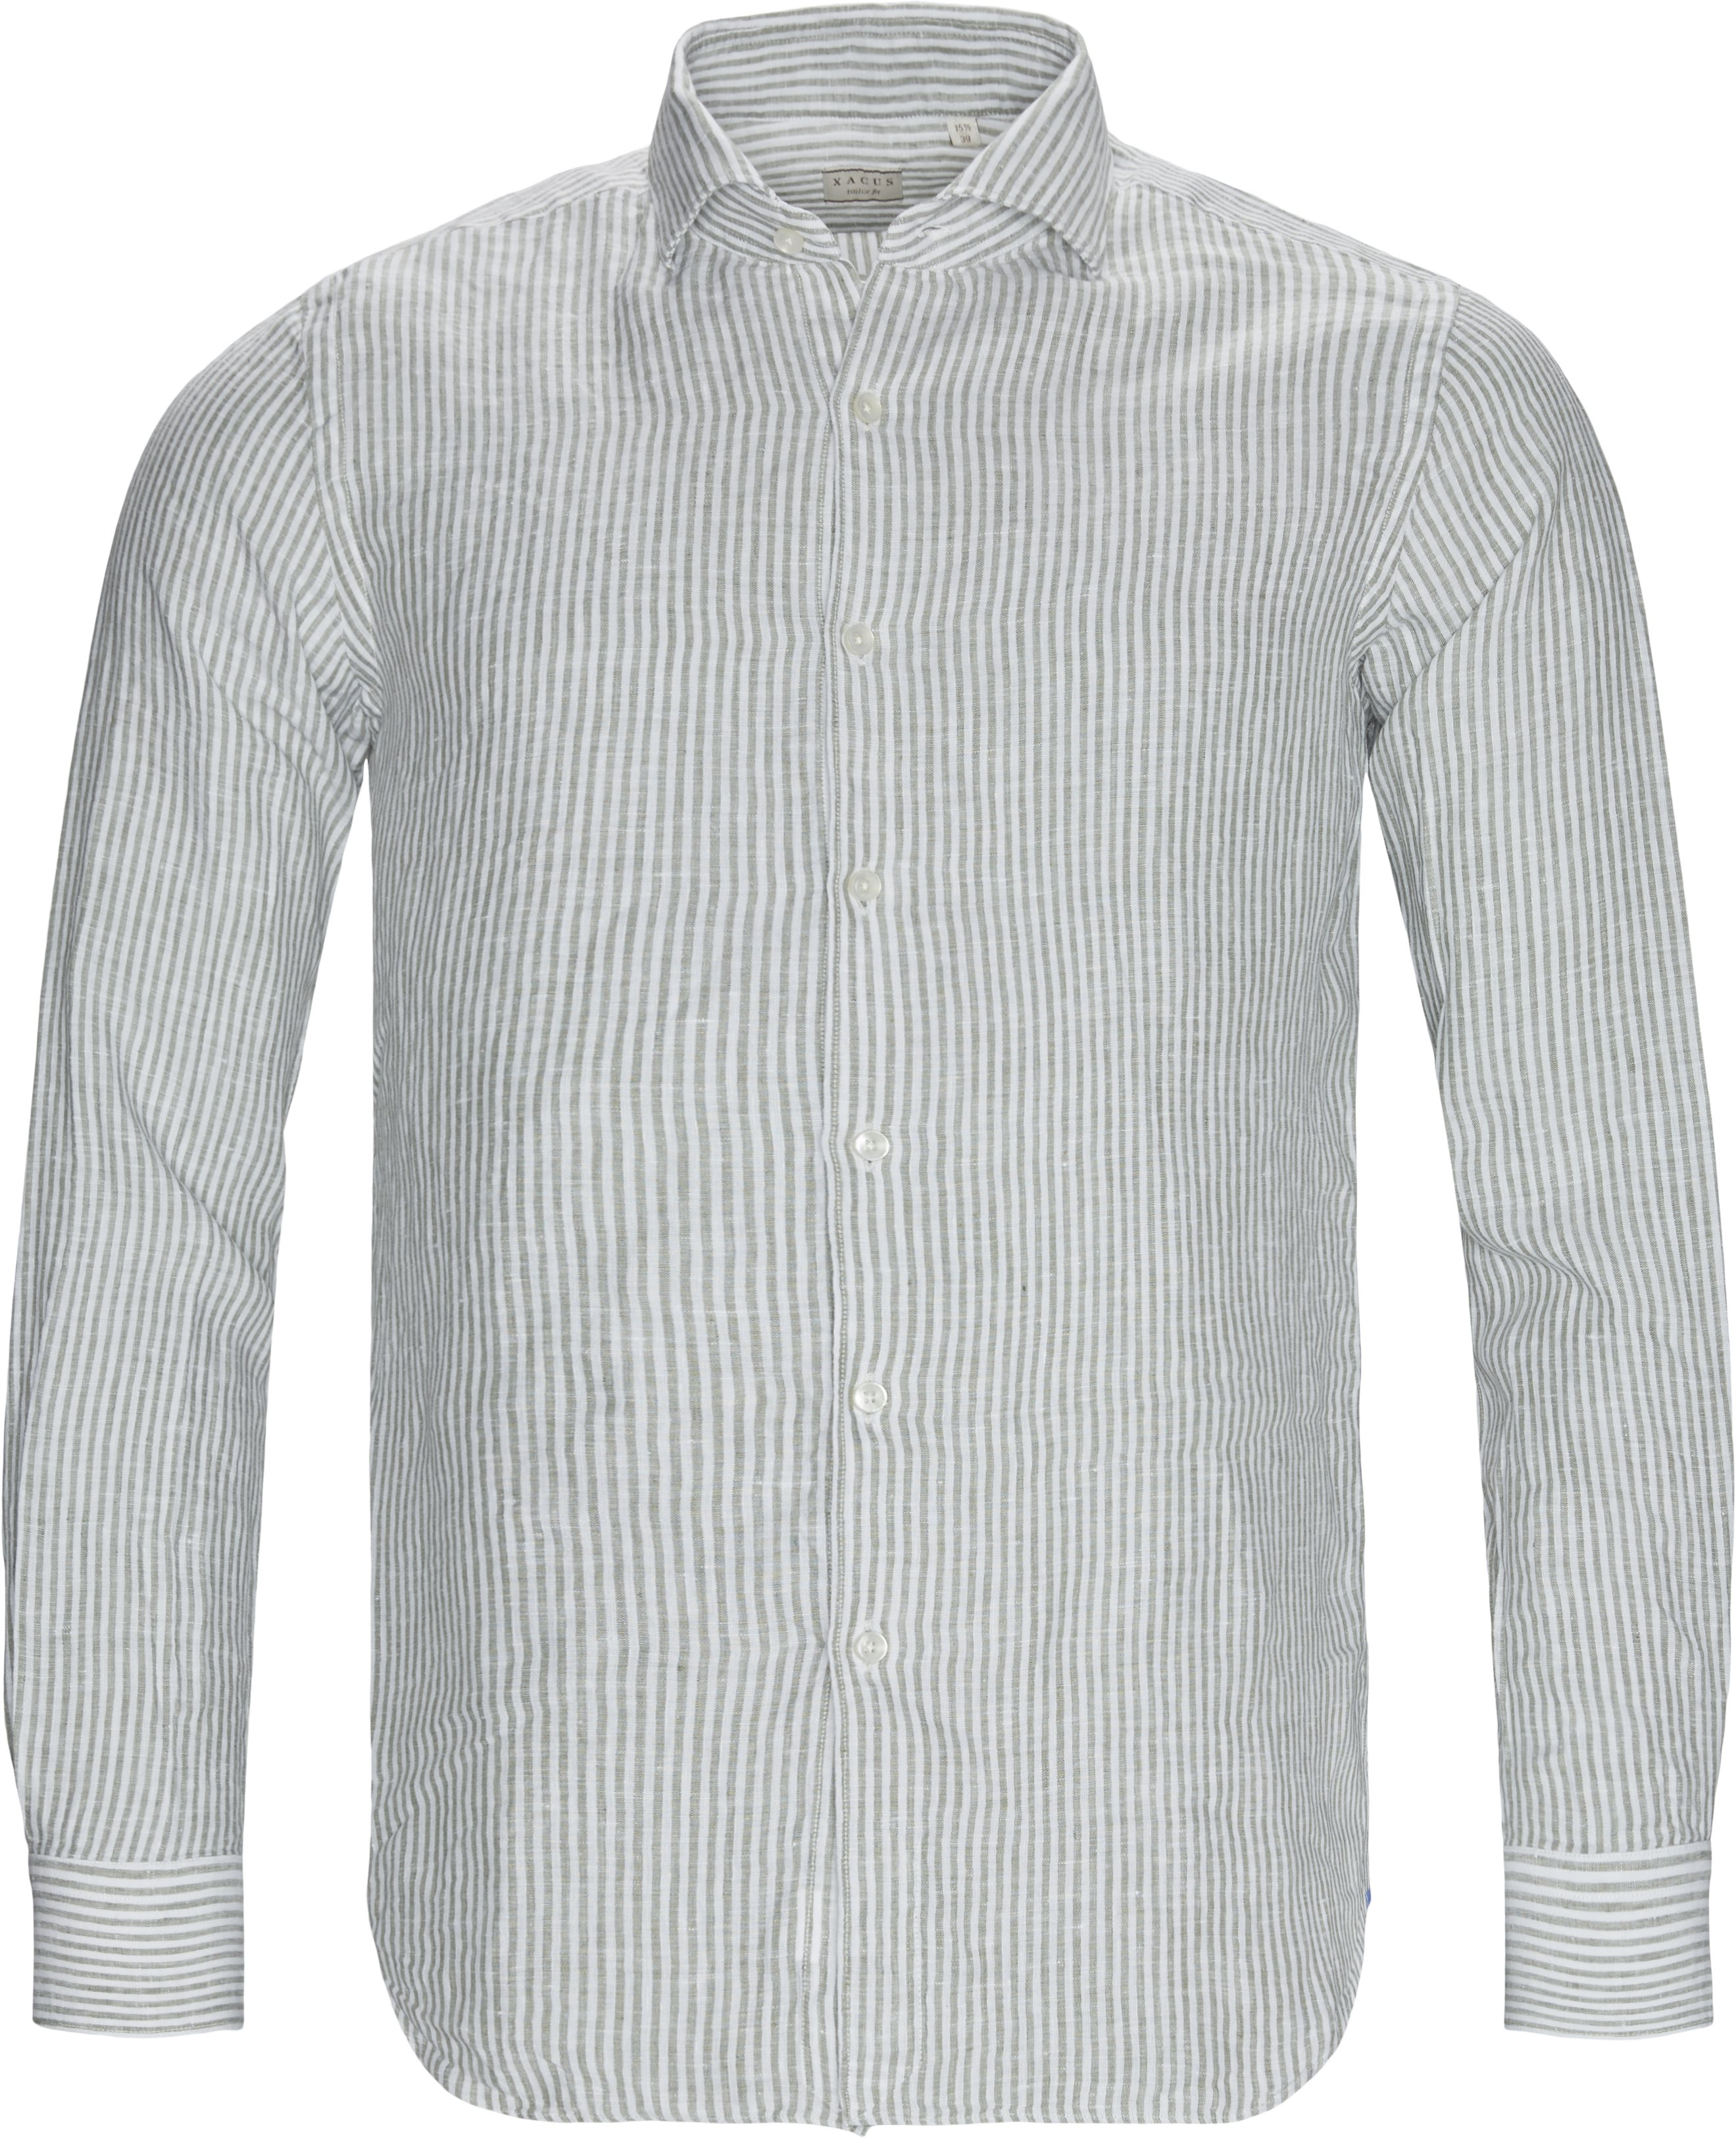 Skjorter - Tailored fit - Hvid